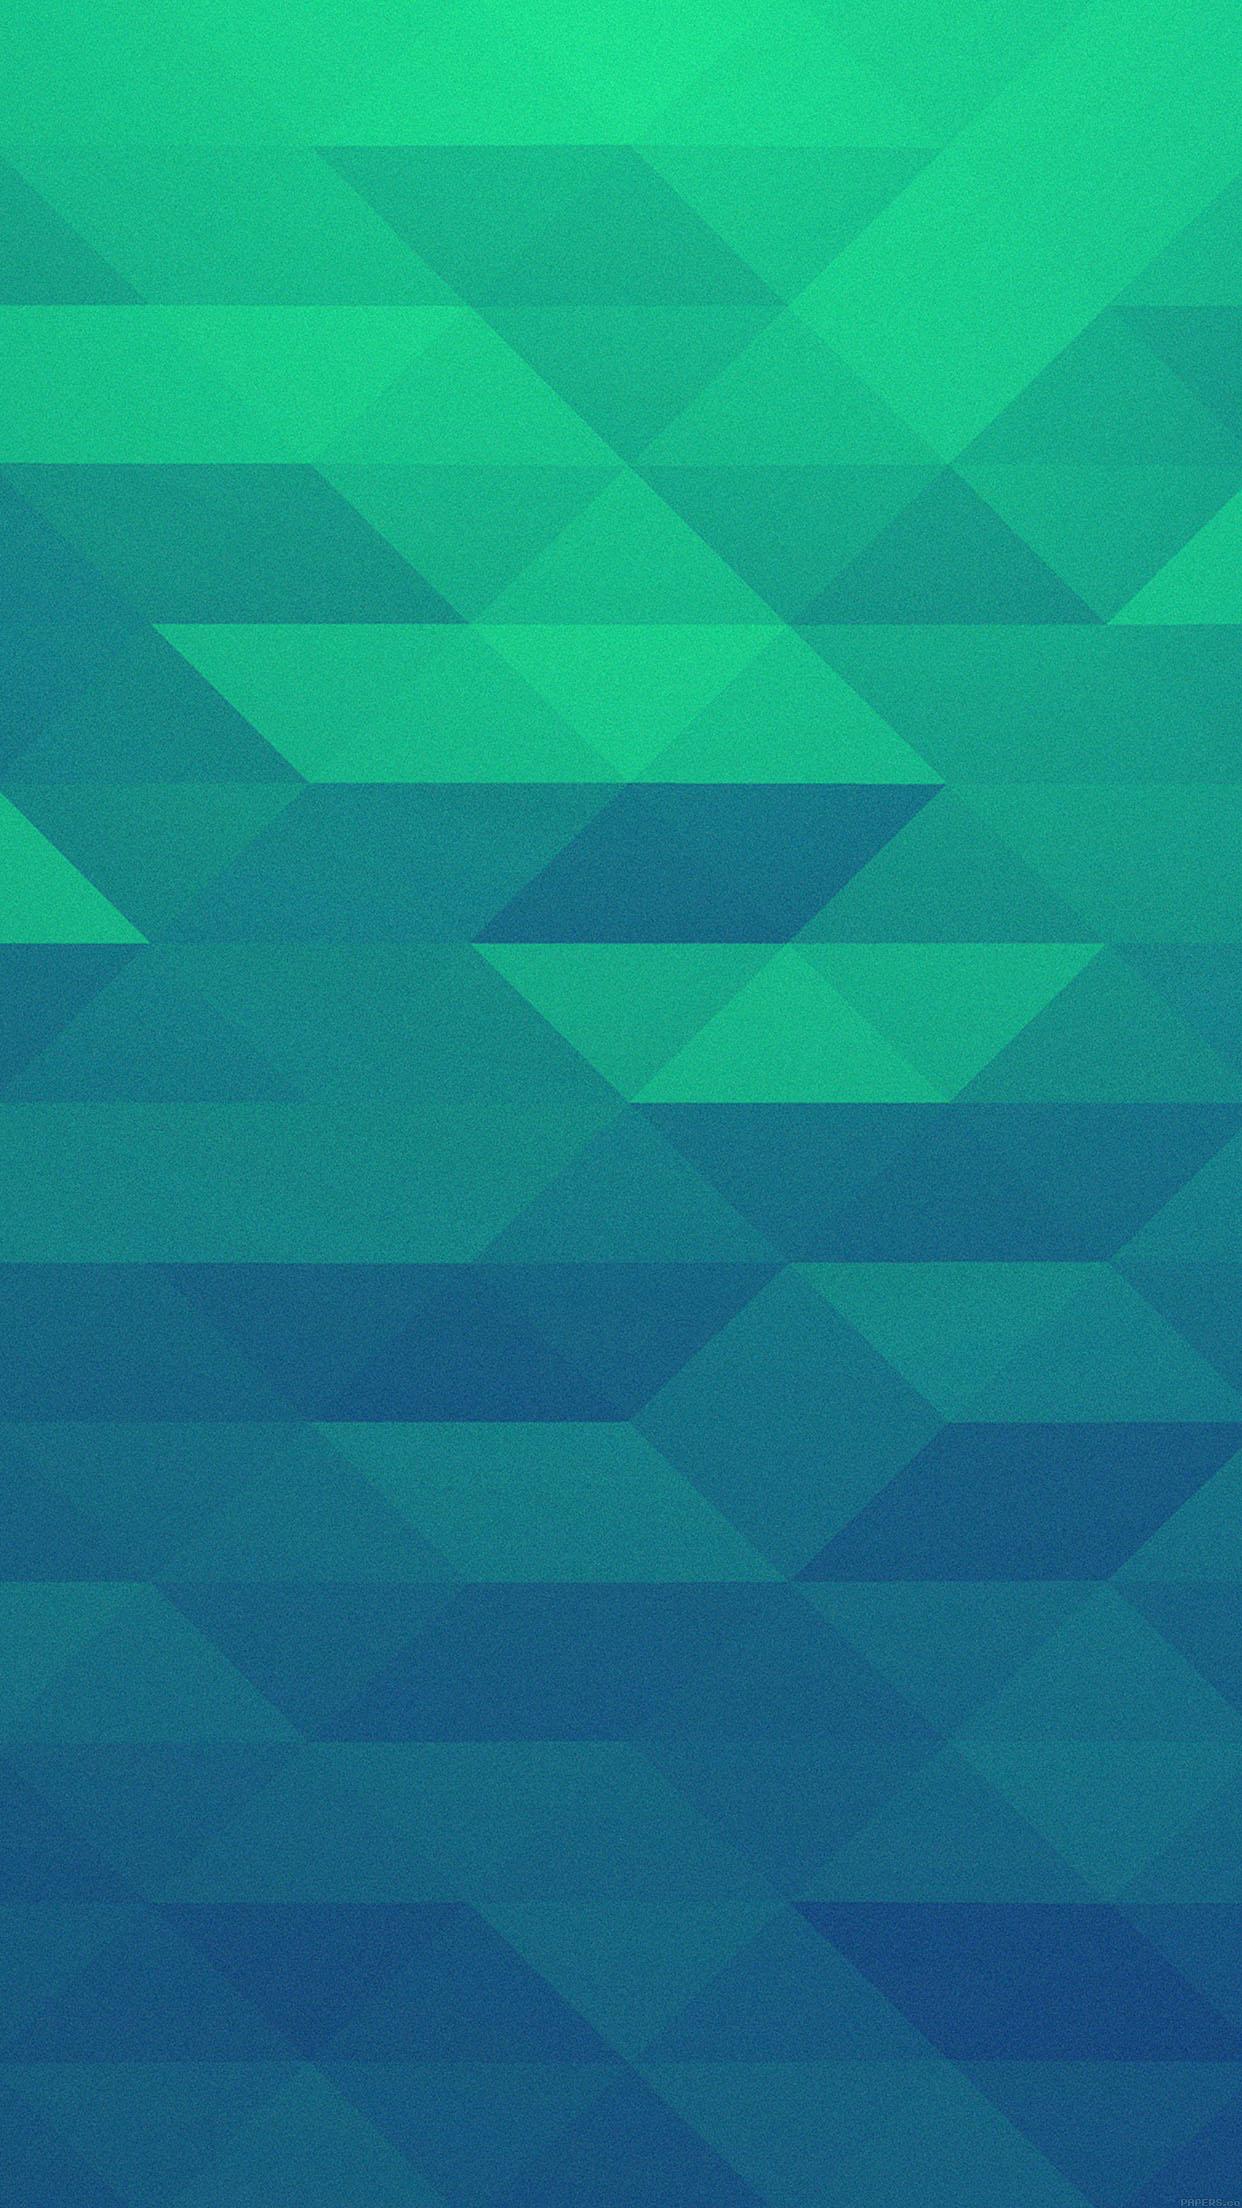 Iphone 11 Wallpaper Pro Green